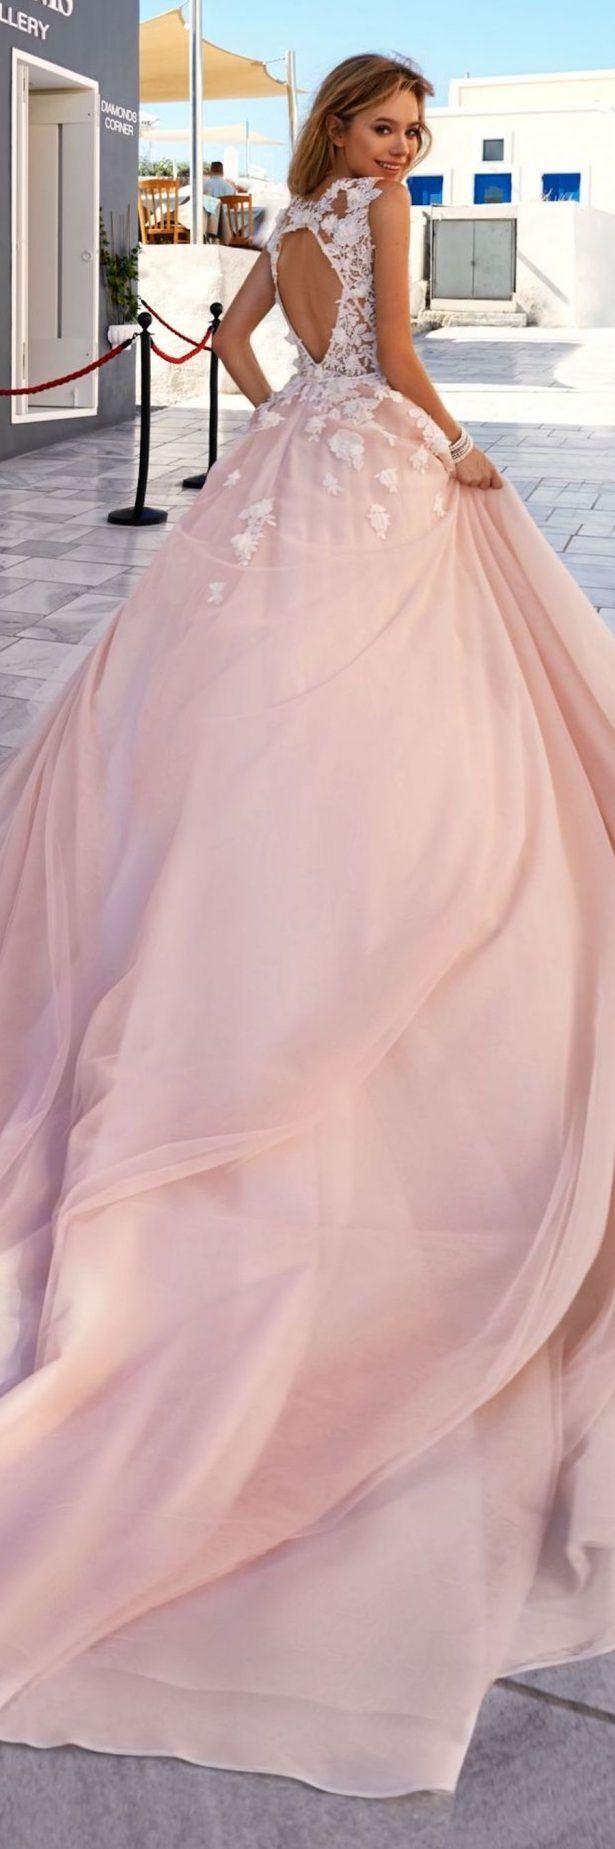 Encantador Steven Khalil Precios Vestidos De Novia Adorno ...